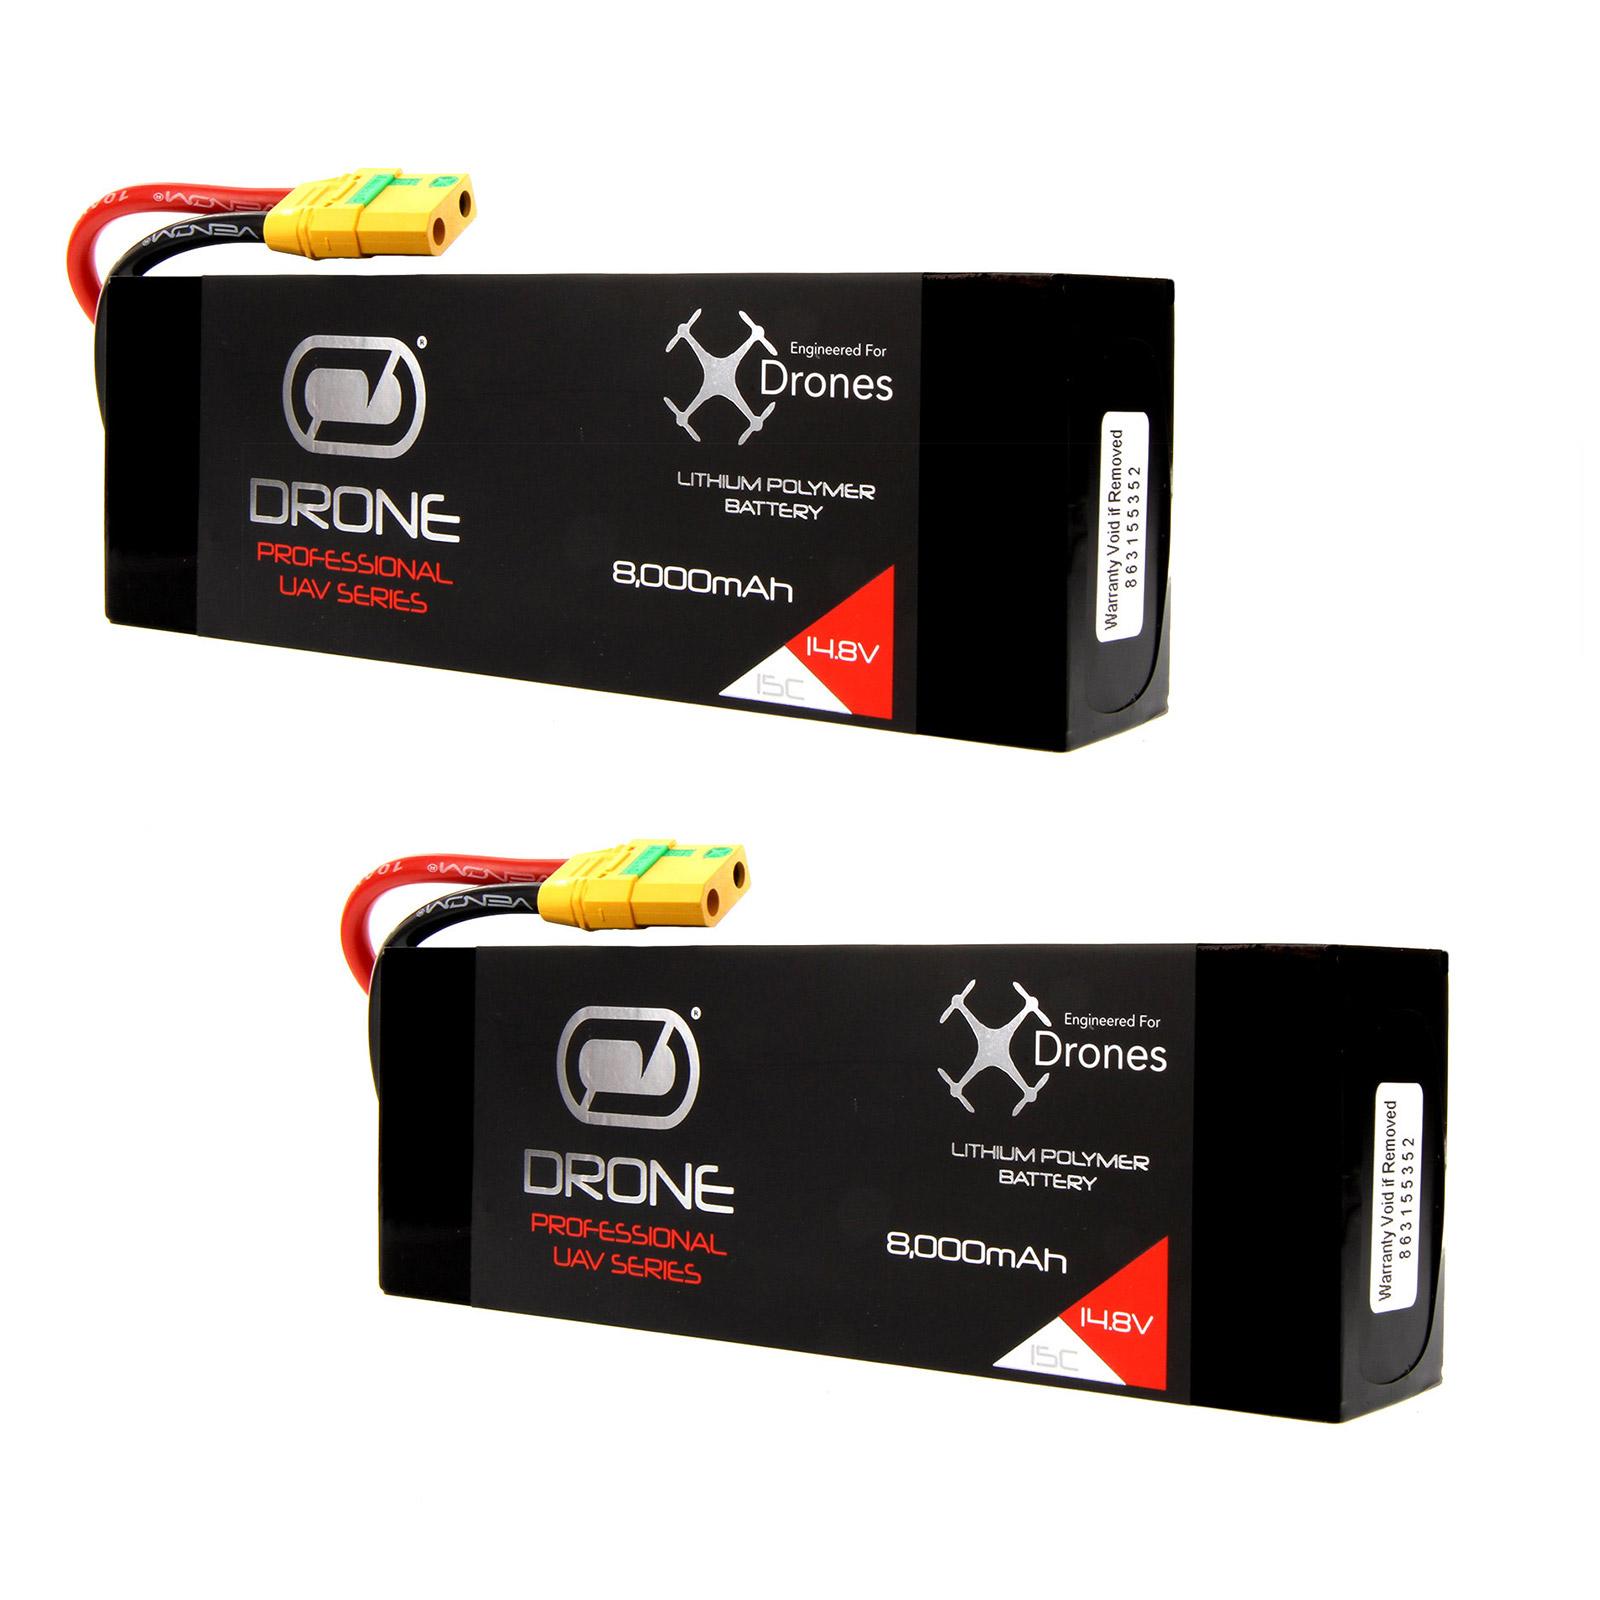 VENOM 8000mAh 4S 14.8V Drone Professional High Capacity Battery, 15C LiPo with XT90-S Plug x2 Packs